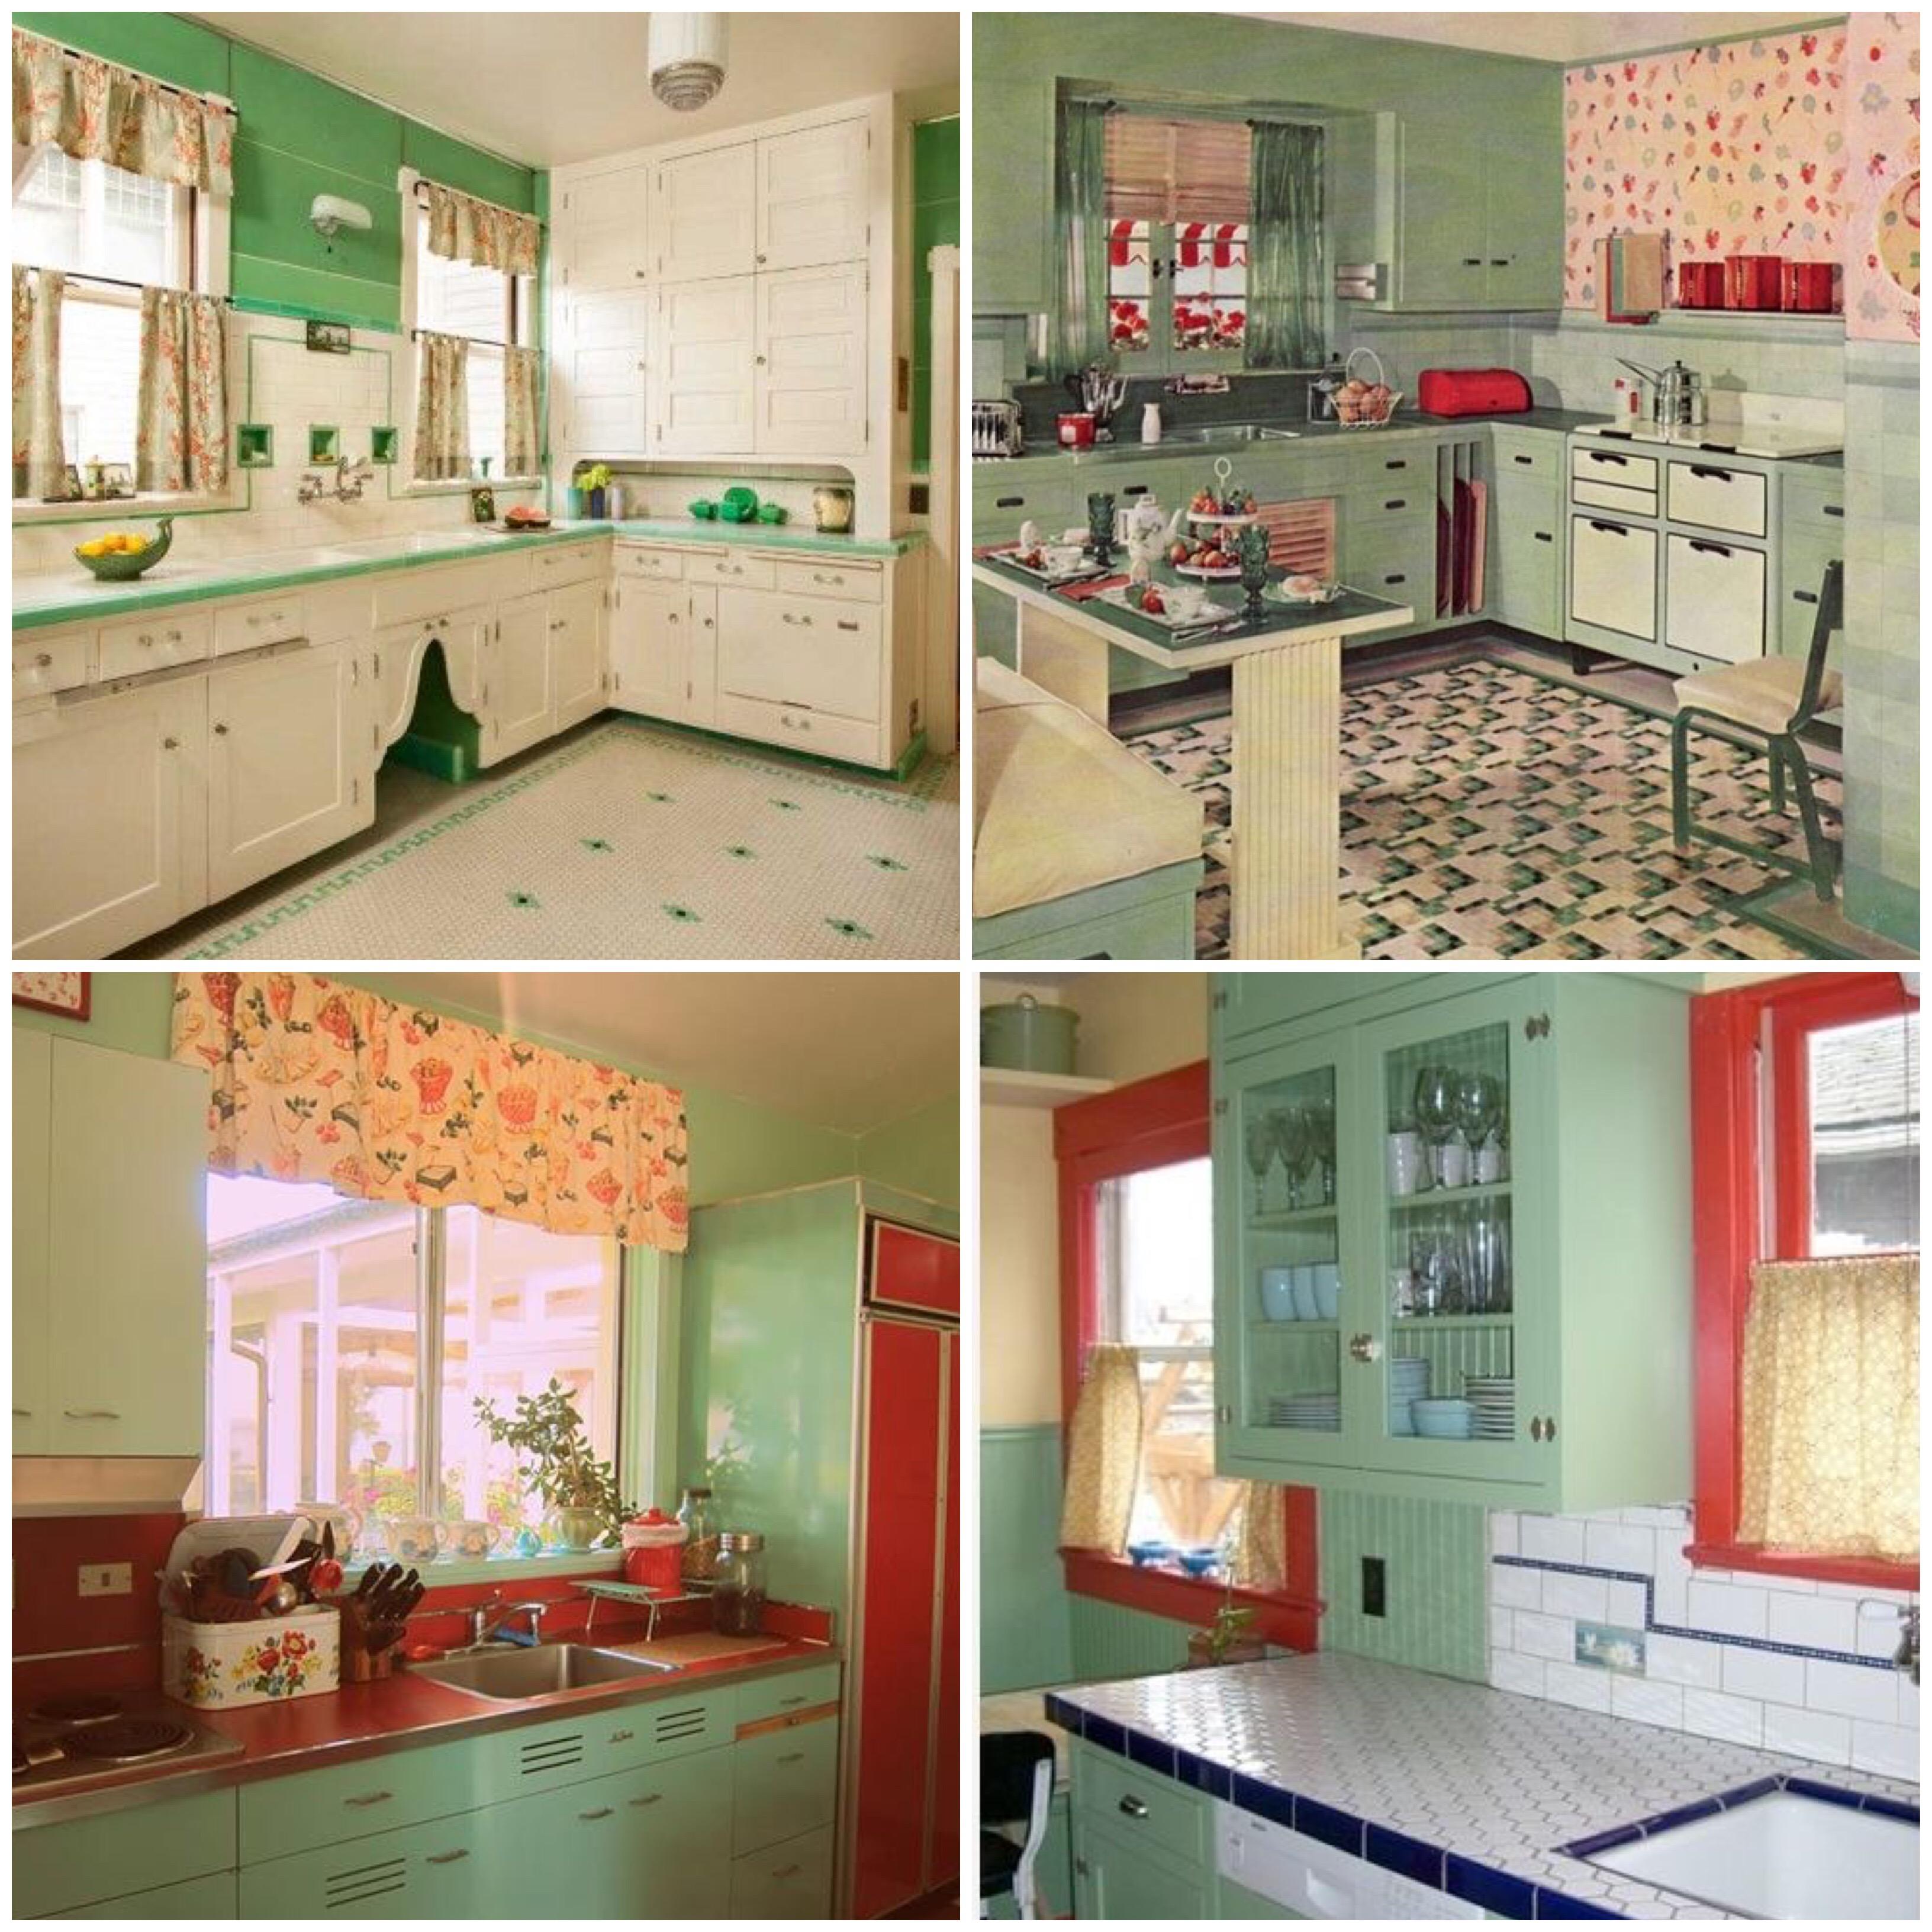 Old Vintage Kitchen: Taste The Rainbow: Vintage Kitchens Of Every Shade